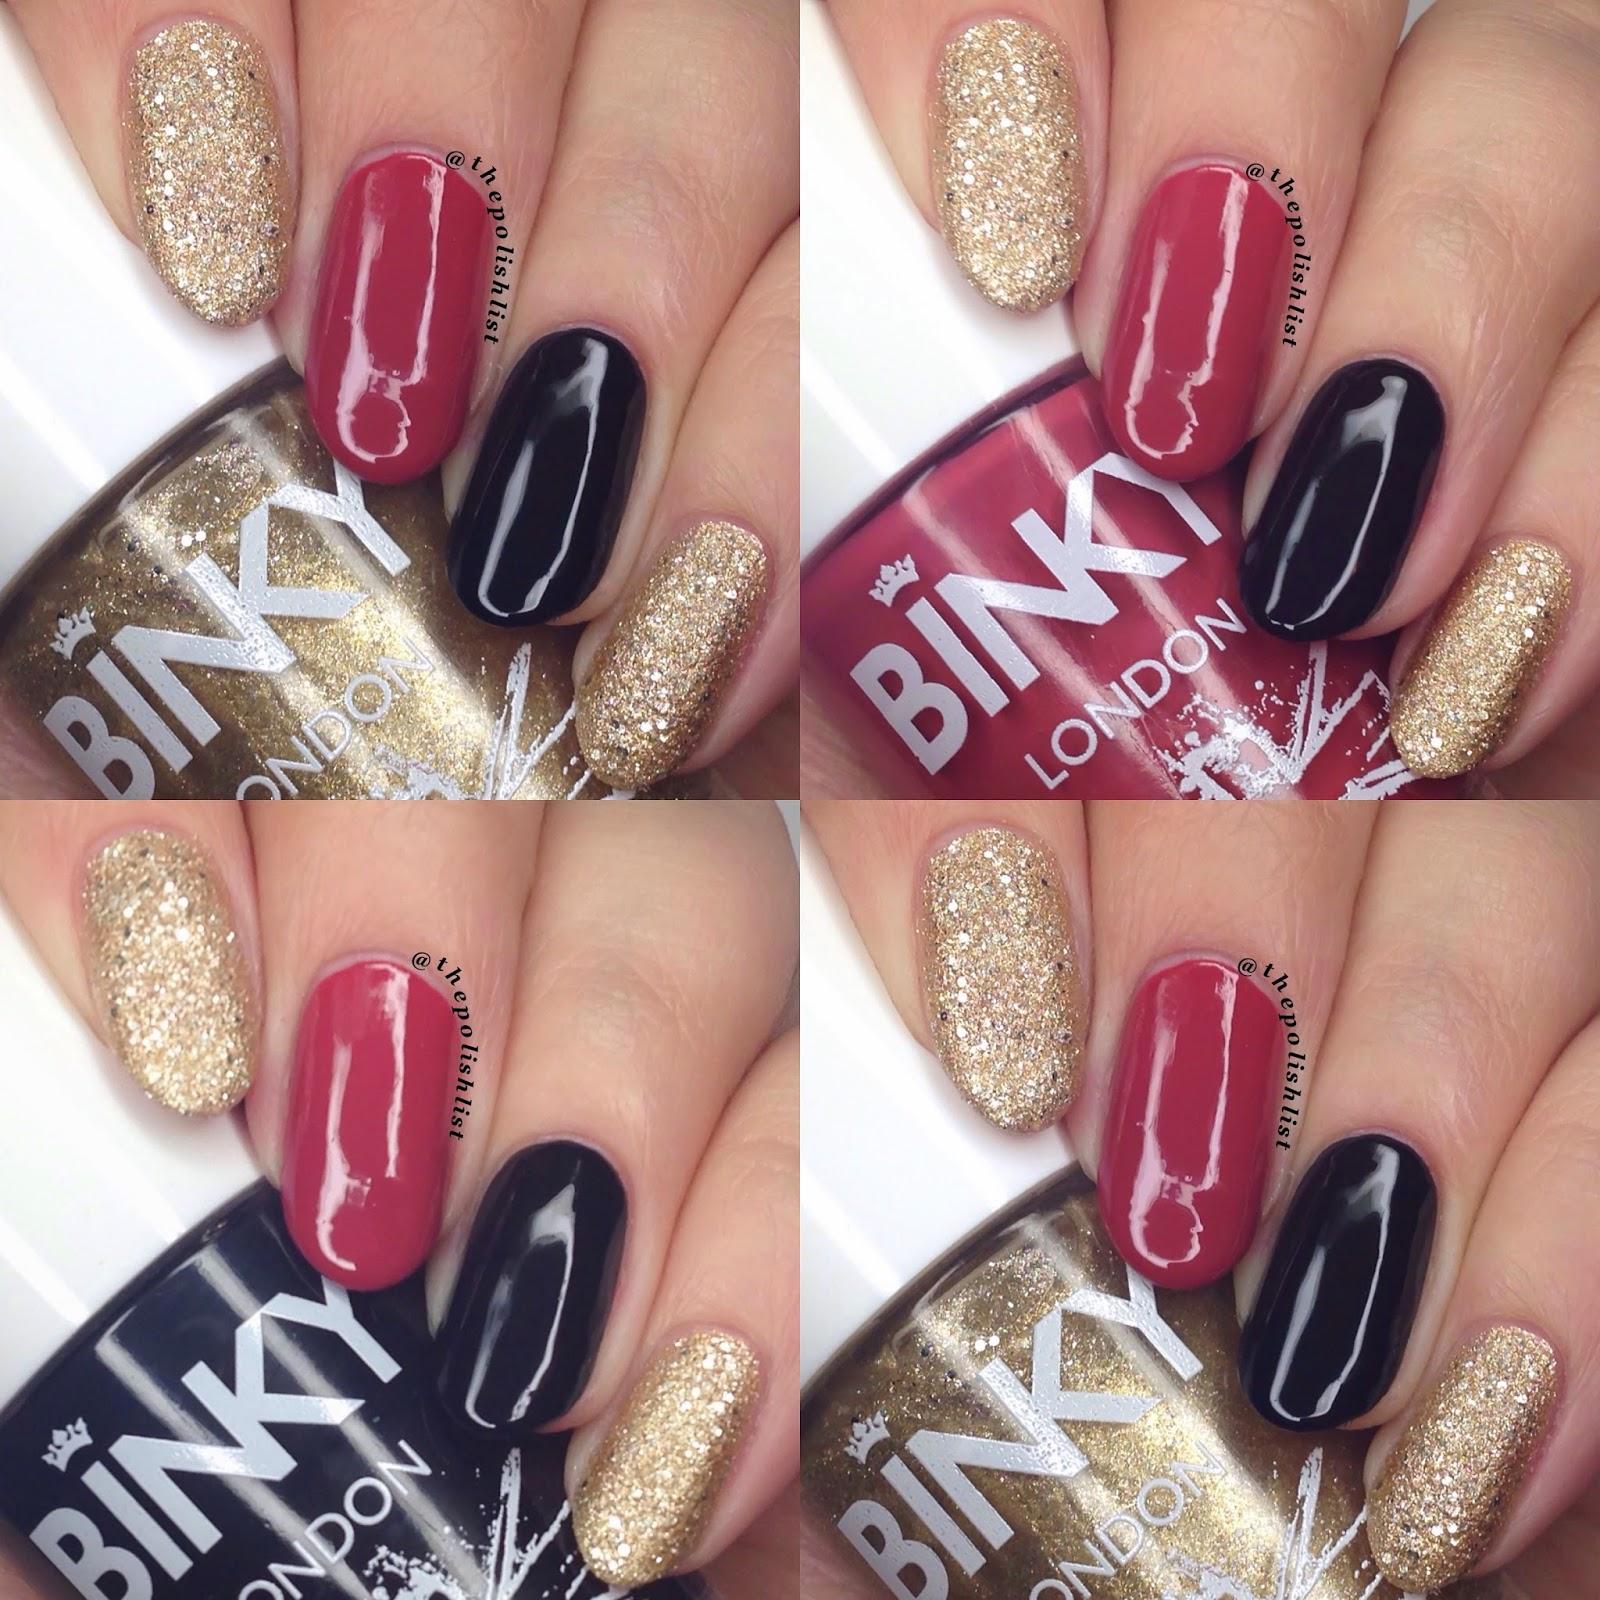 Nail Art London: The Polish List: Binky London